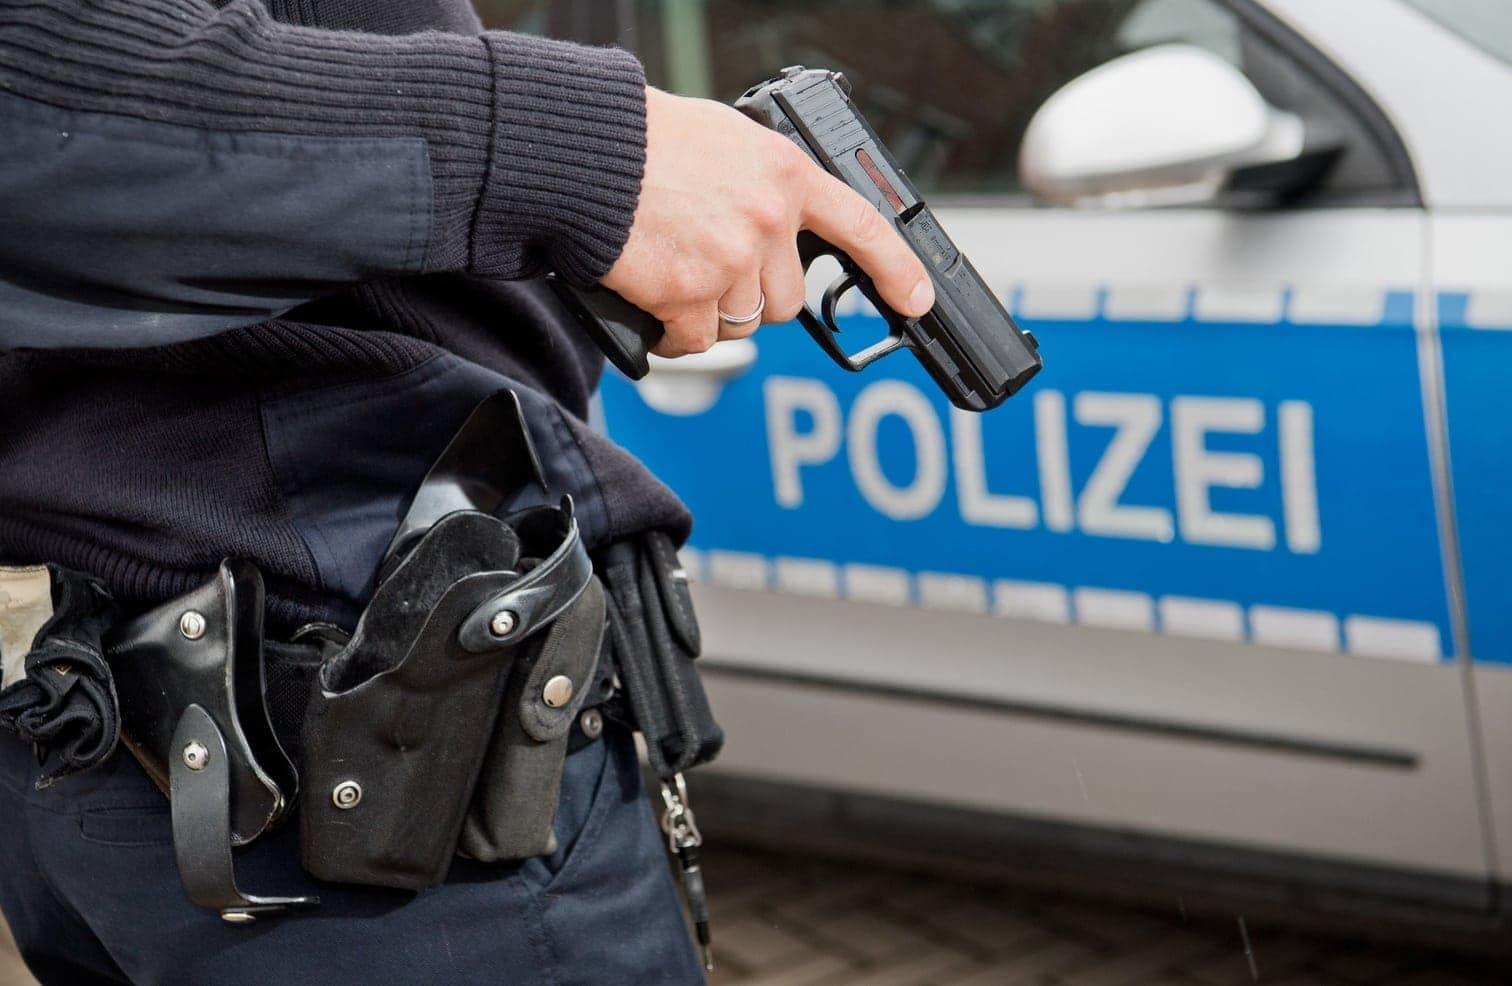 Polizei Pistole Waffe